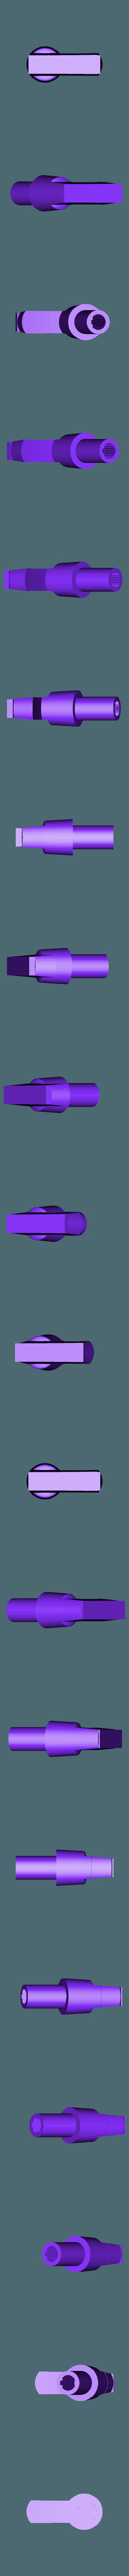 steamArm.stl Download free STL file Delonghi Satrap coffee machine steam valve knob/arm • 3D print object, xmas75